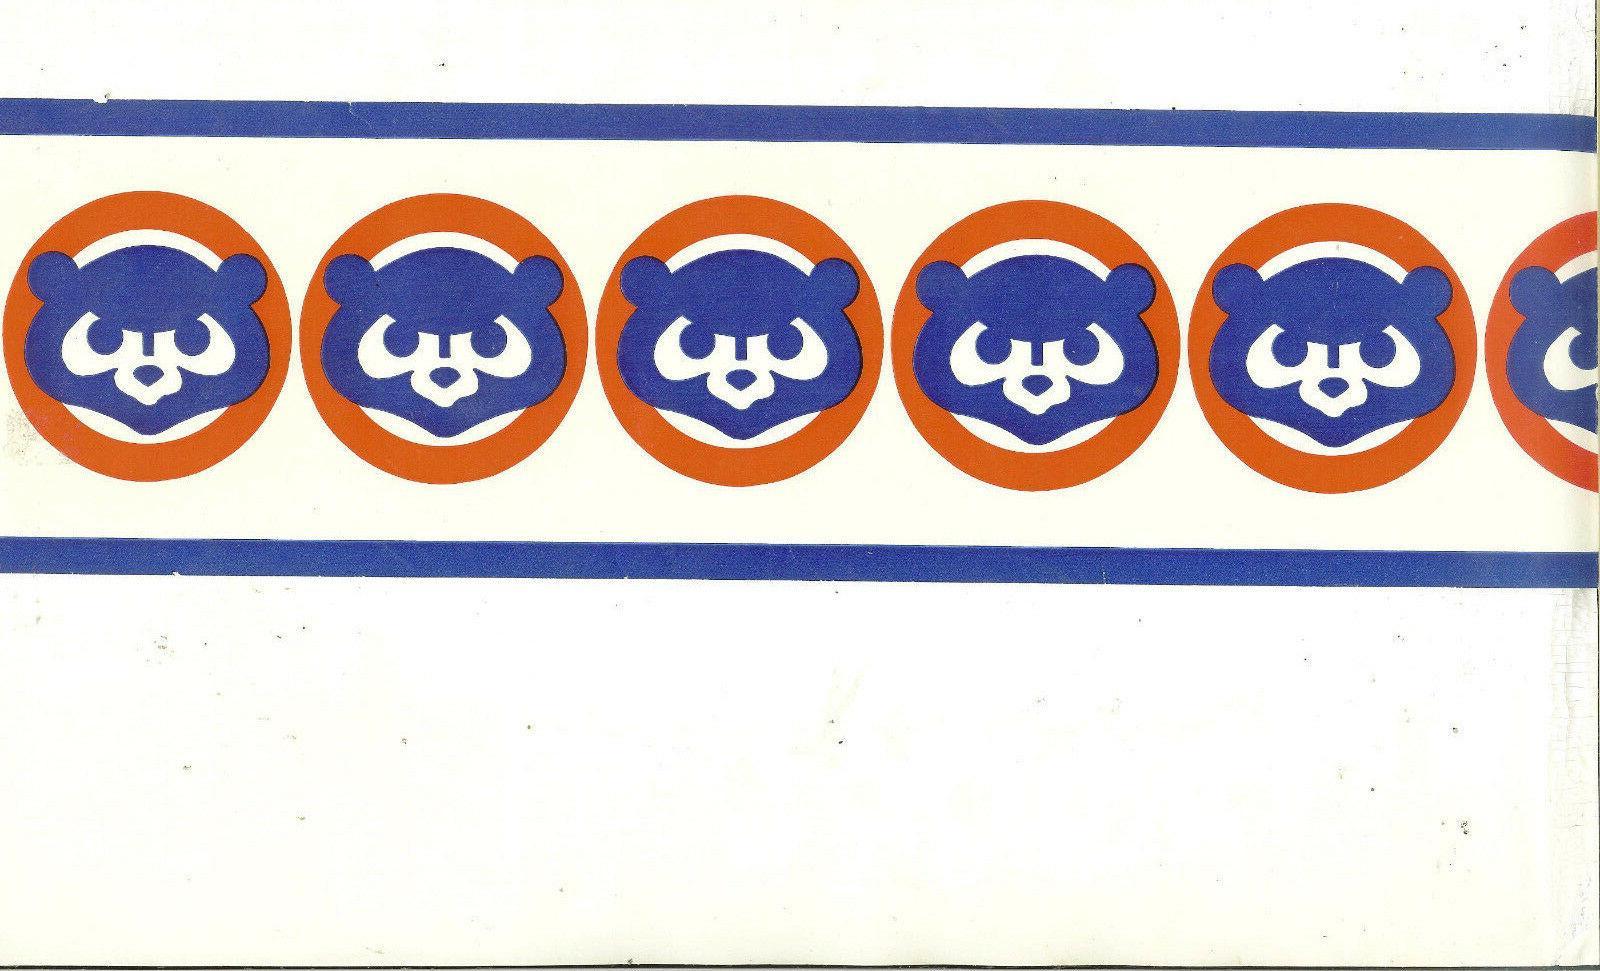 mlb team chicago cubs wallpaper border